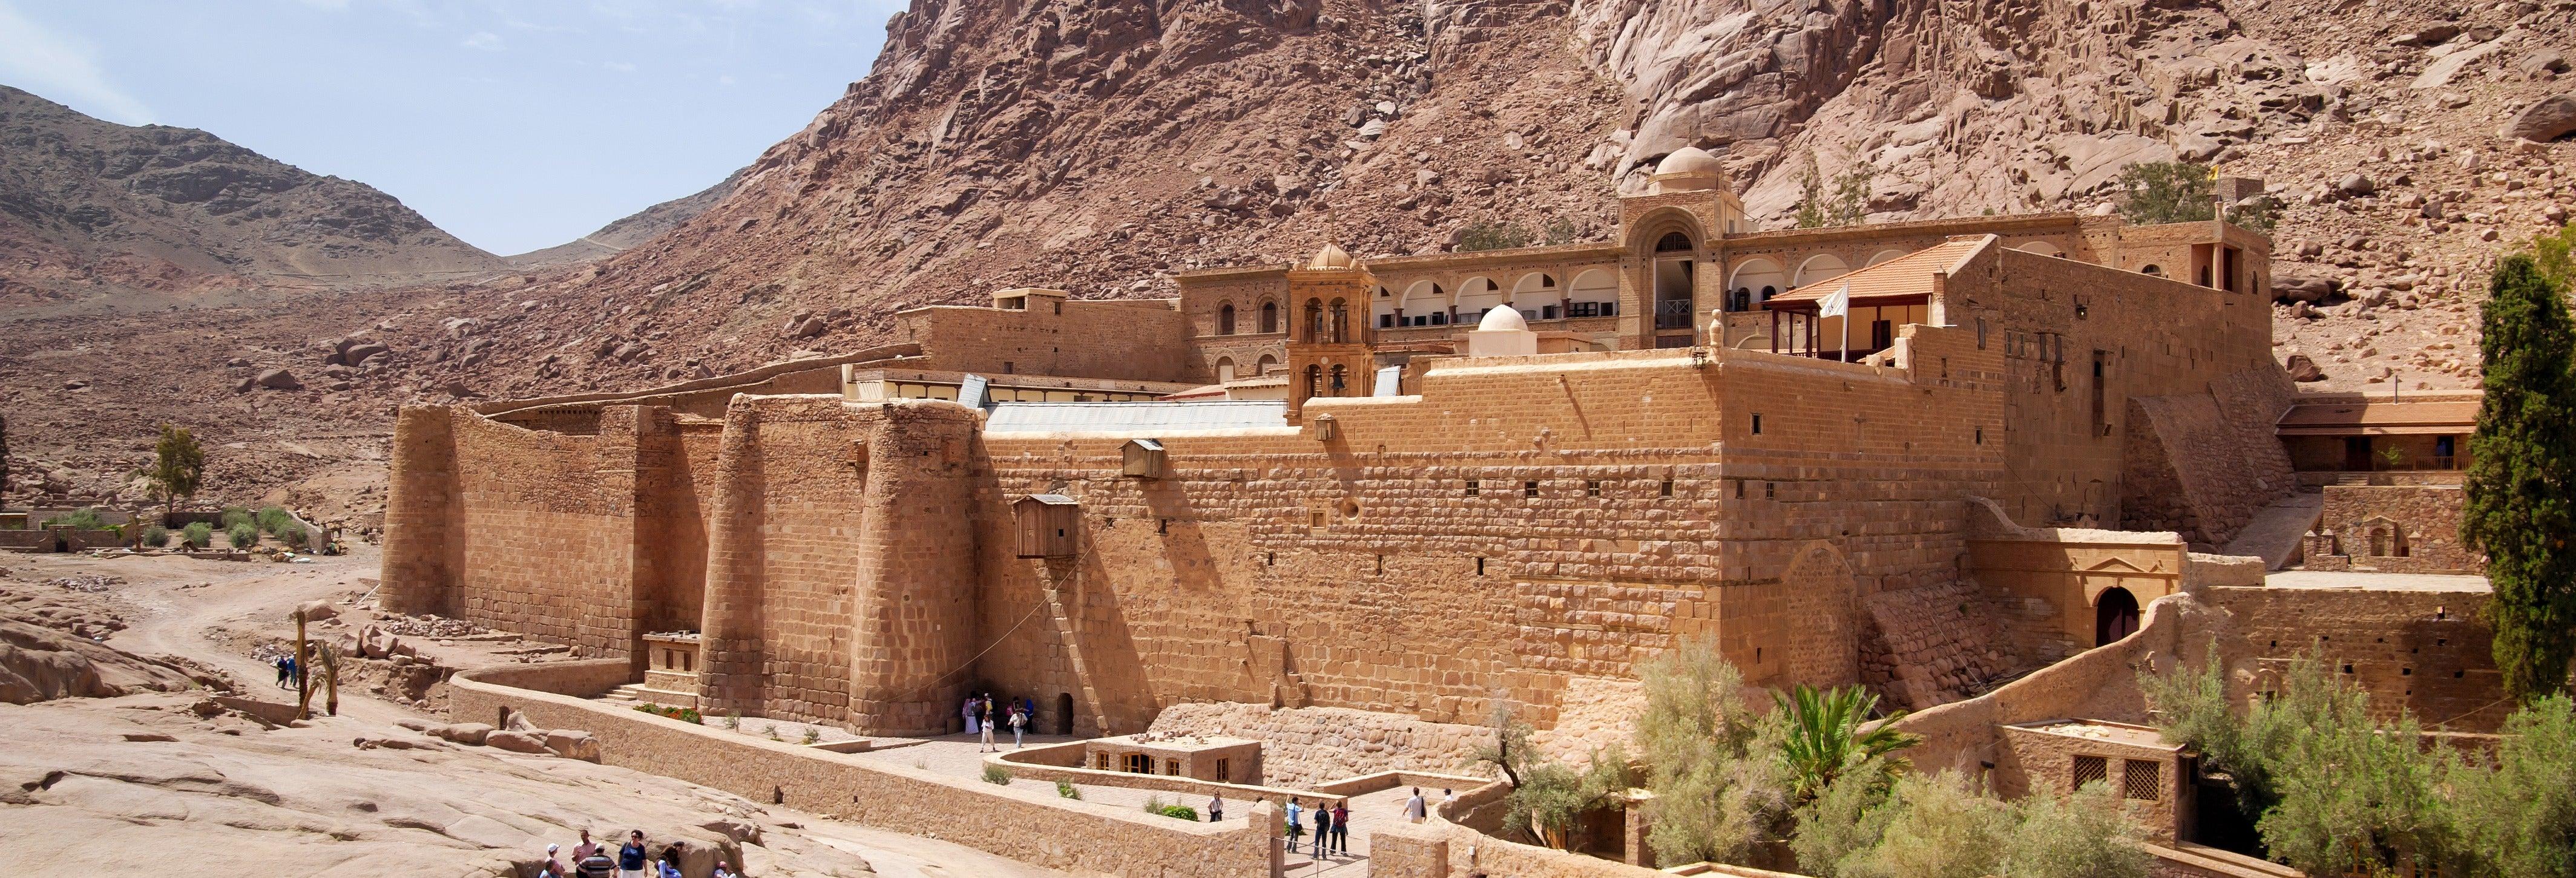 Mount Sinai and Saint Catherine's Monastery